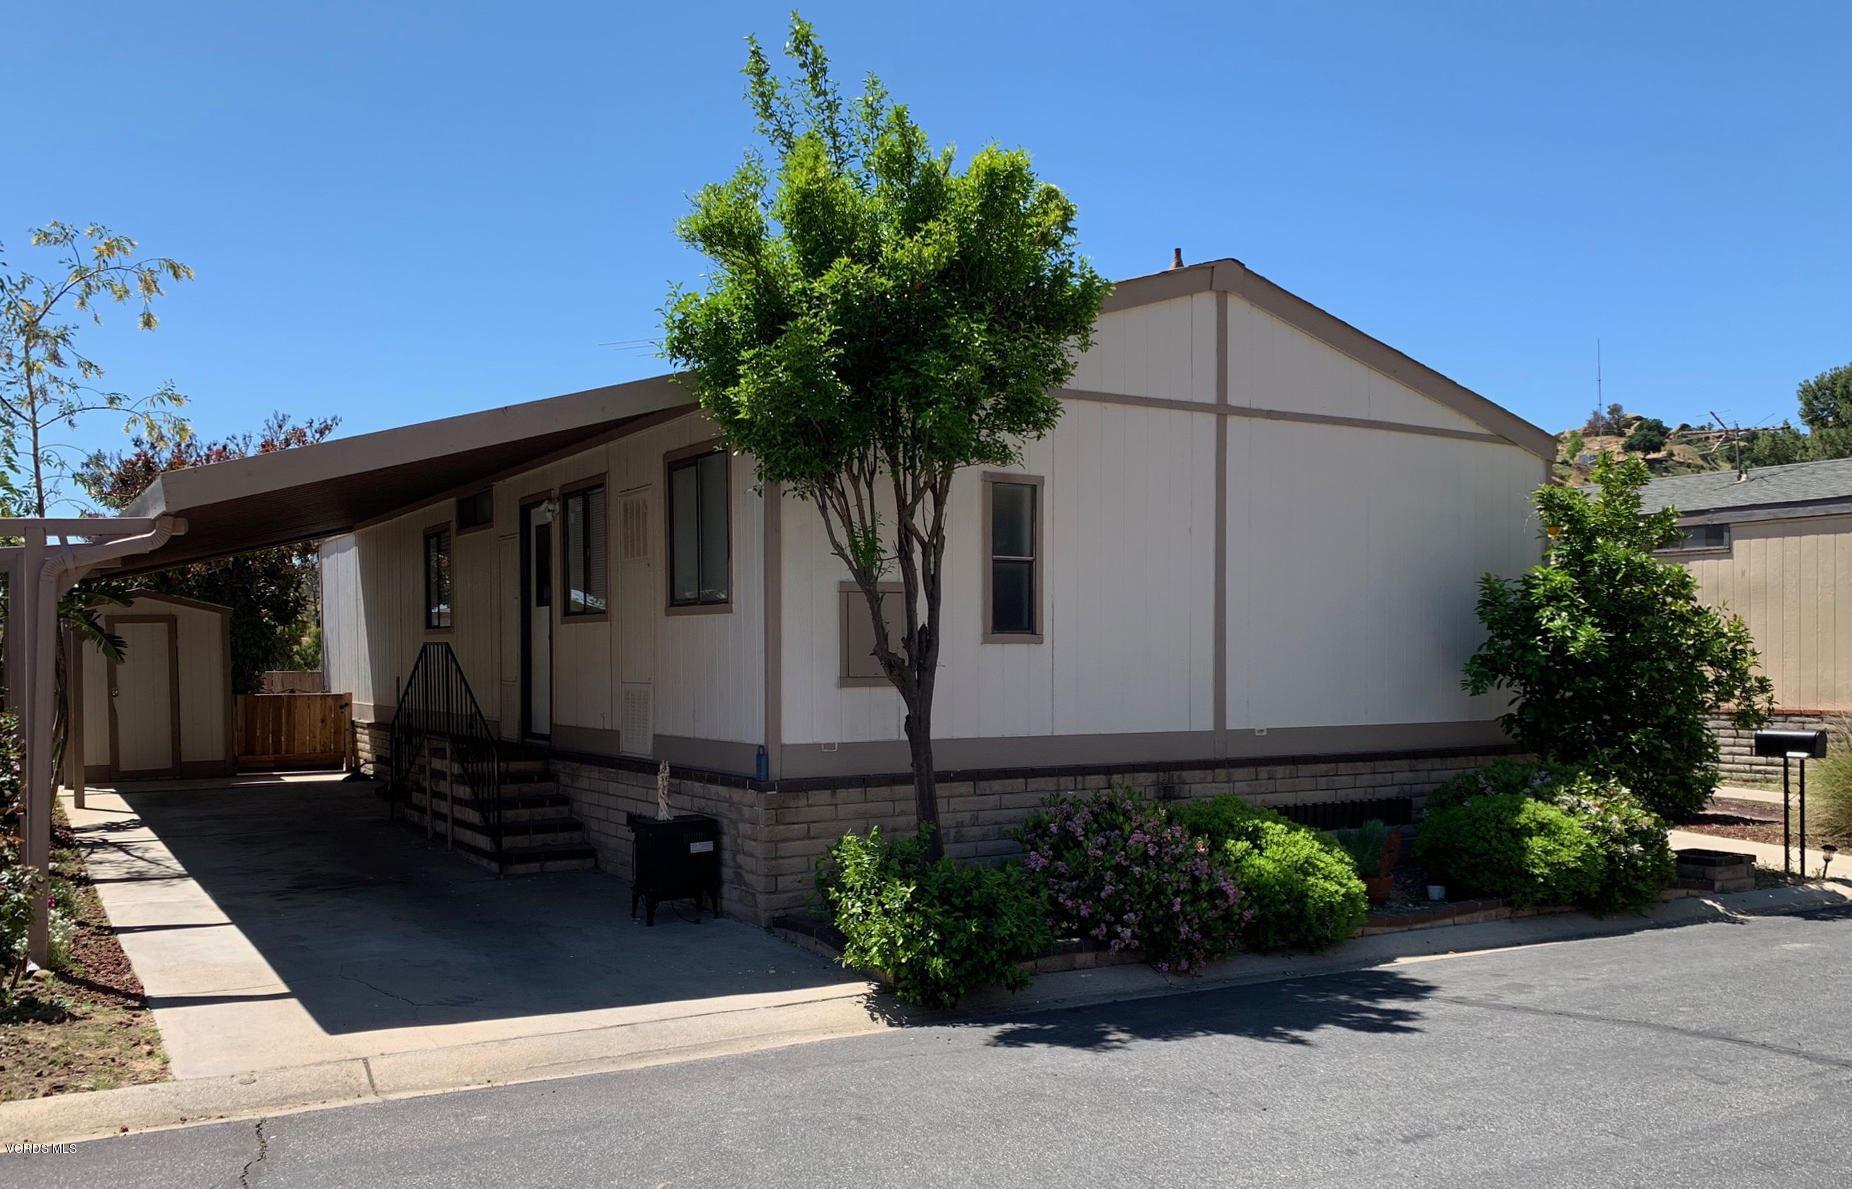 24425 Woolsey Canyon Road #192, Canoga Park, CA 91304 - MLS#: 219004568